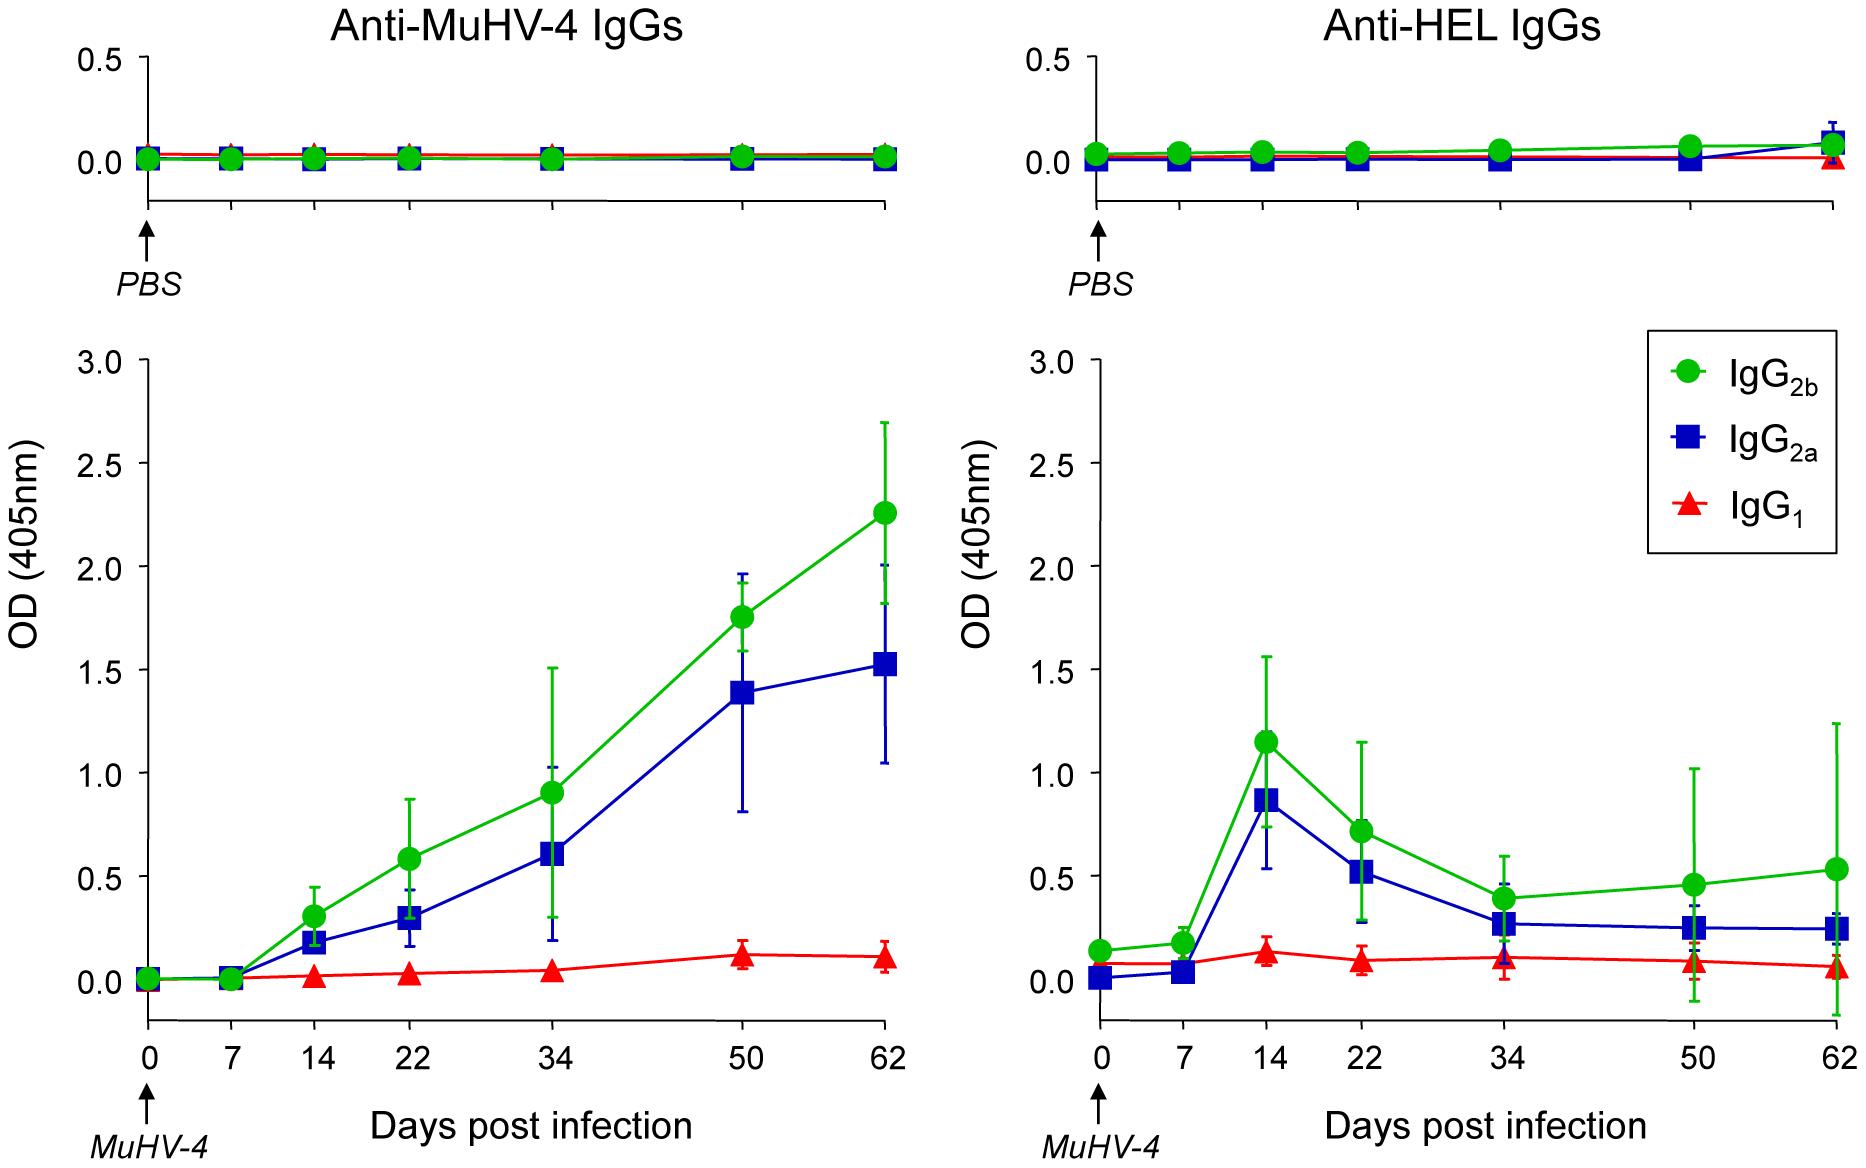 SW<sub>HEL</sub> mice mount a long-lasting anti-MuHV-4 antibody response.